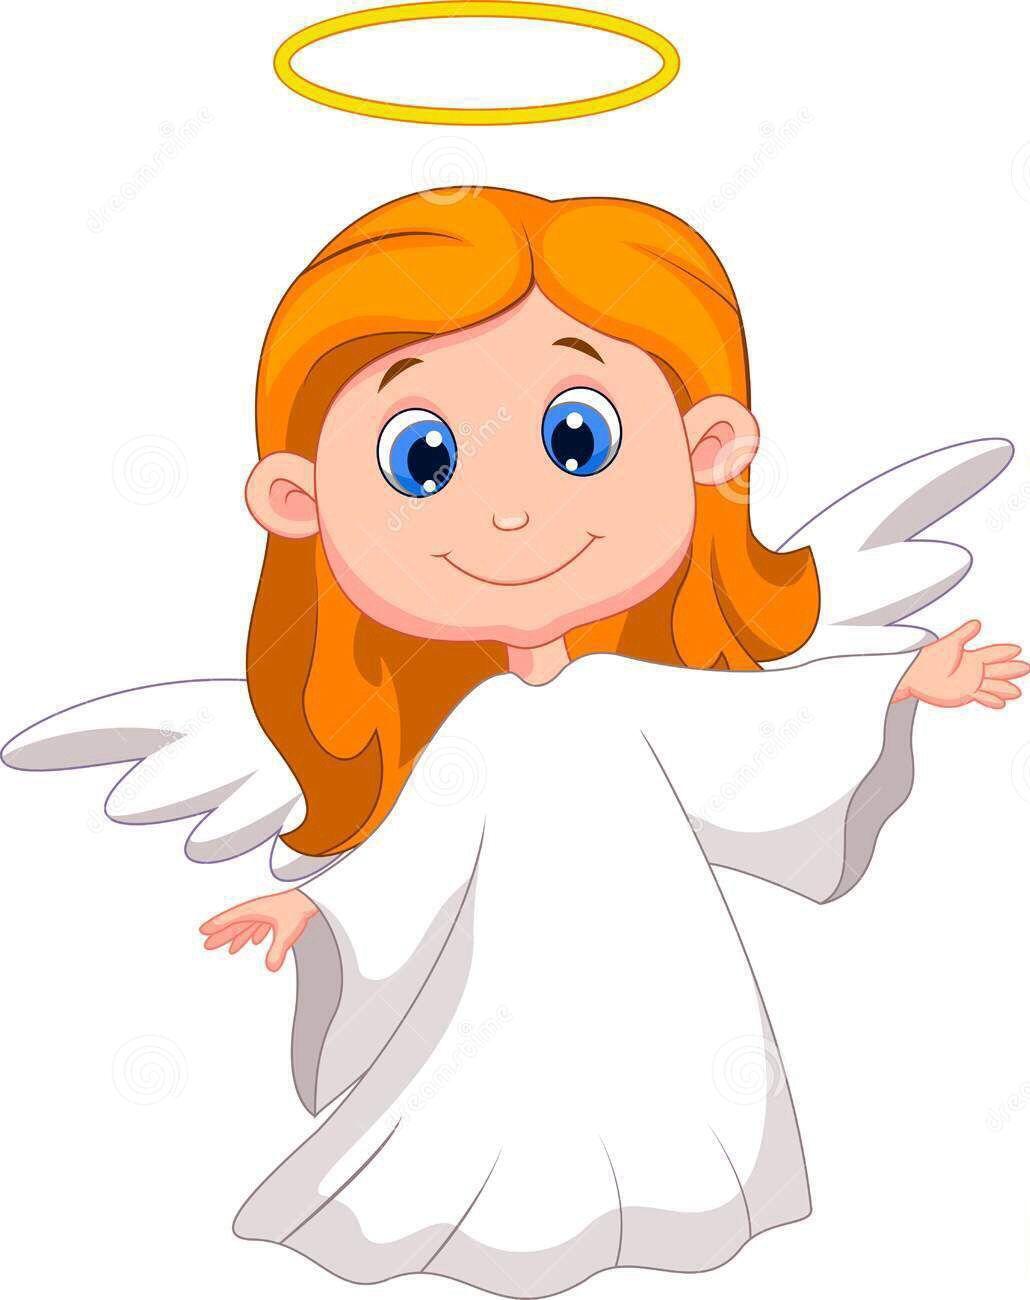 Pin by ANA sanchez on Angels   Angel cartoon, Angel, Angel art